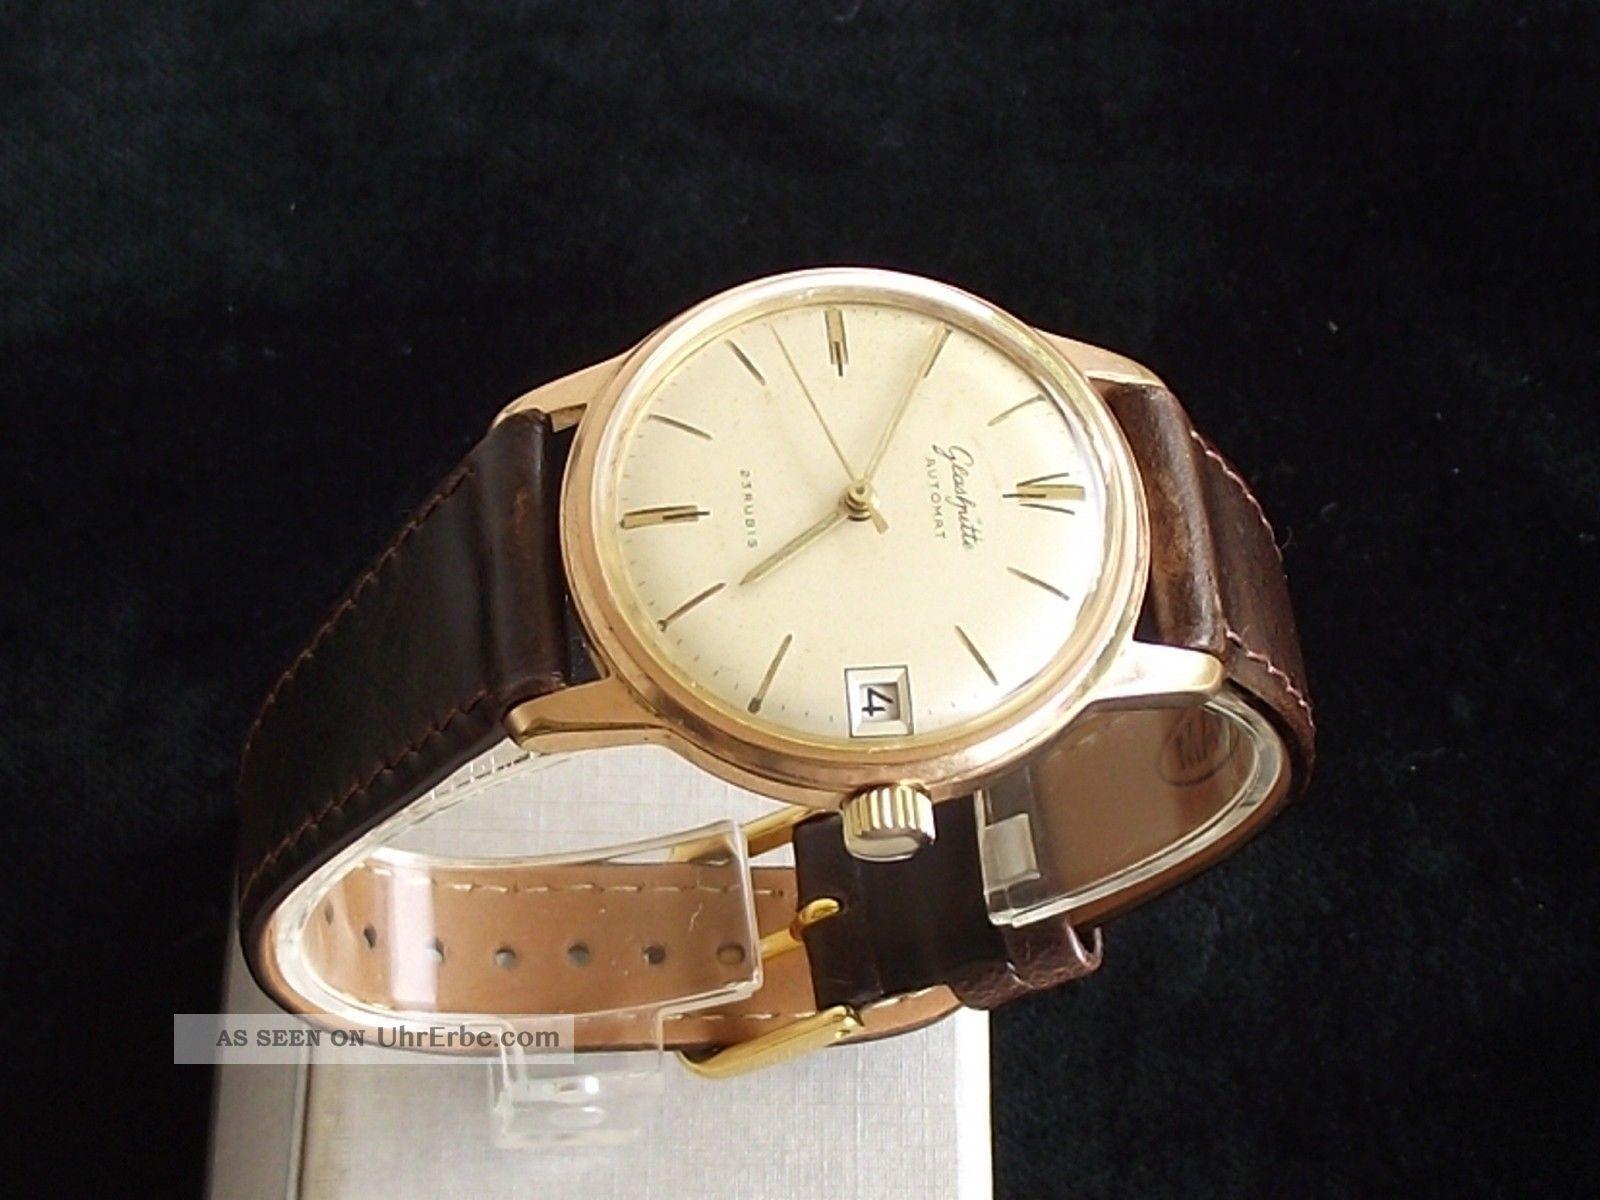 Tolle Klassische Glashütte Gub Automat Kal.  67.  1 Herrenuhr,  Rares Zifferblatt Armbanduhren Bild